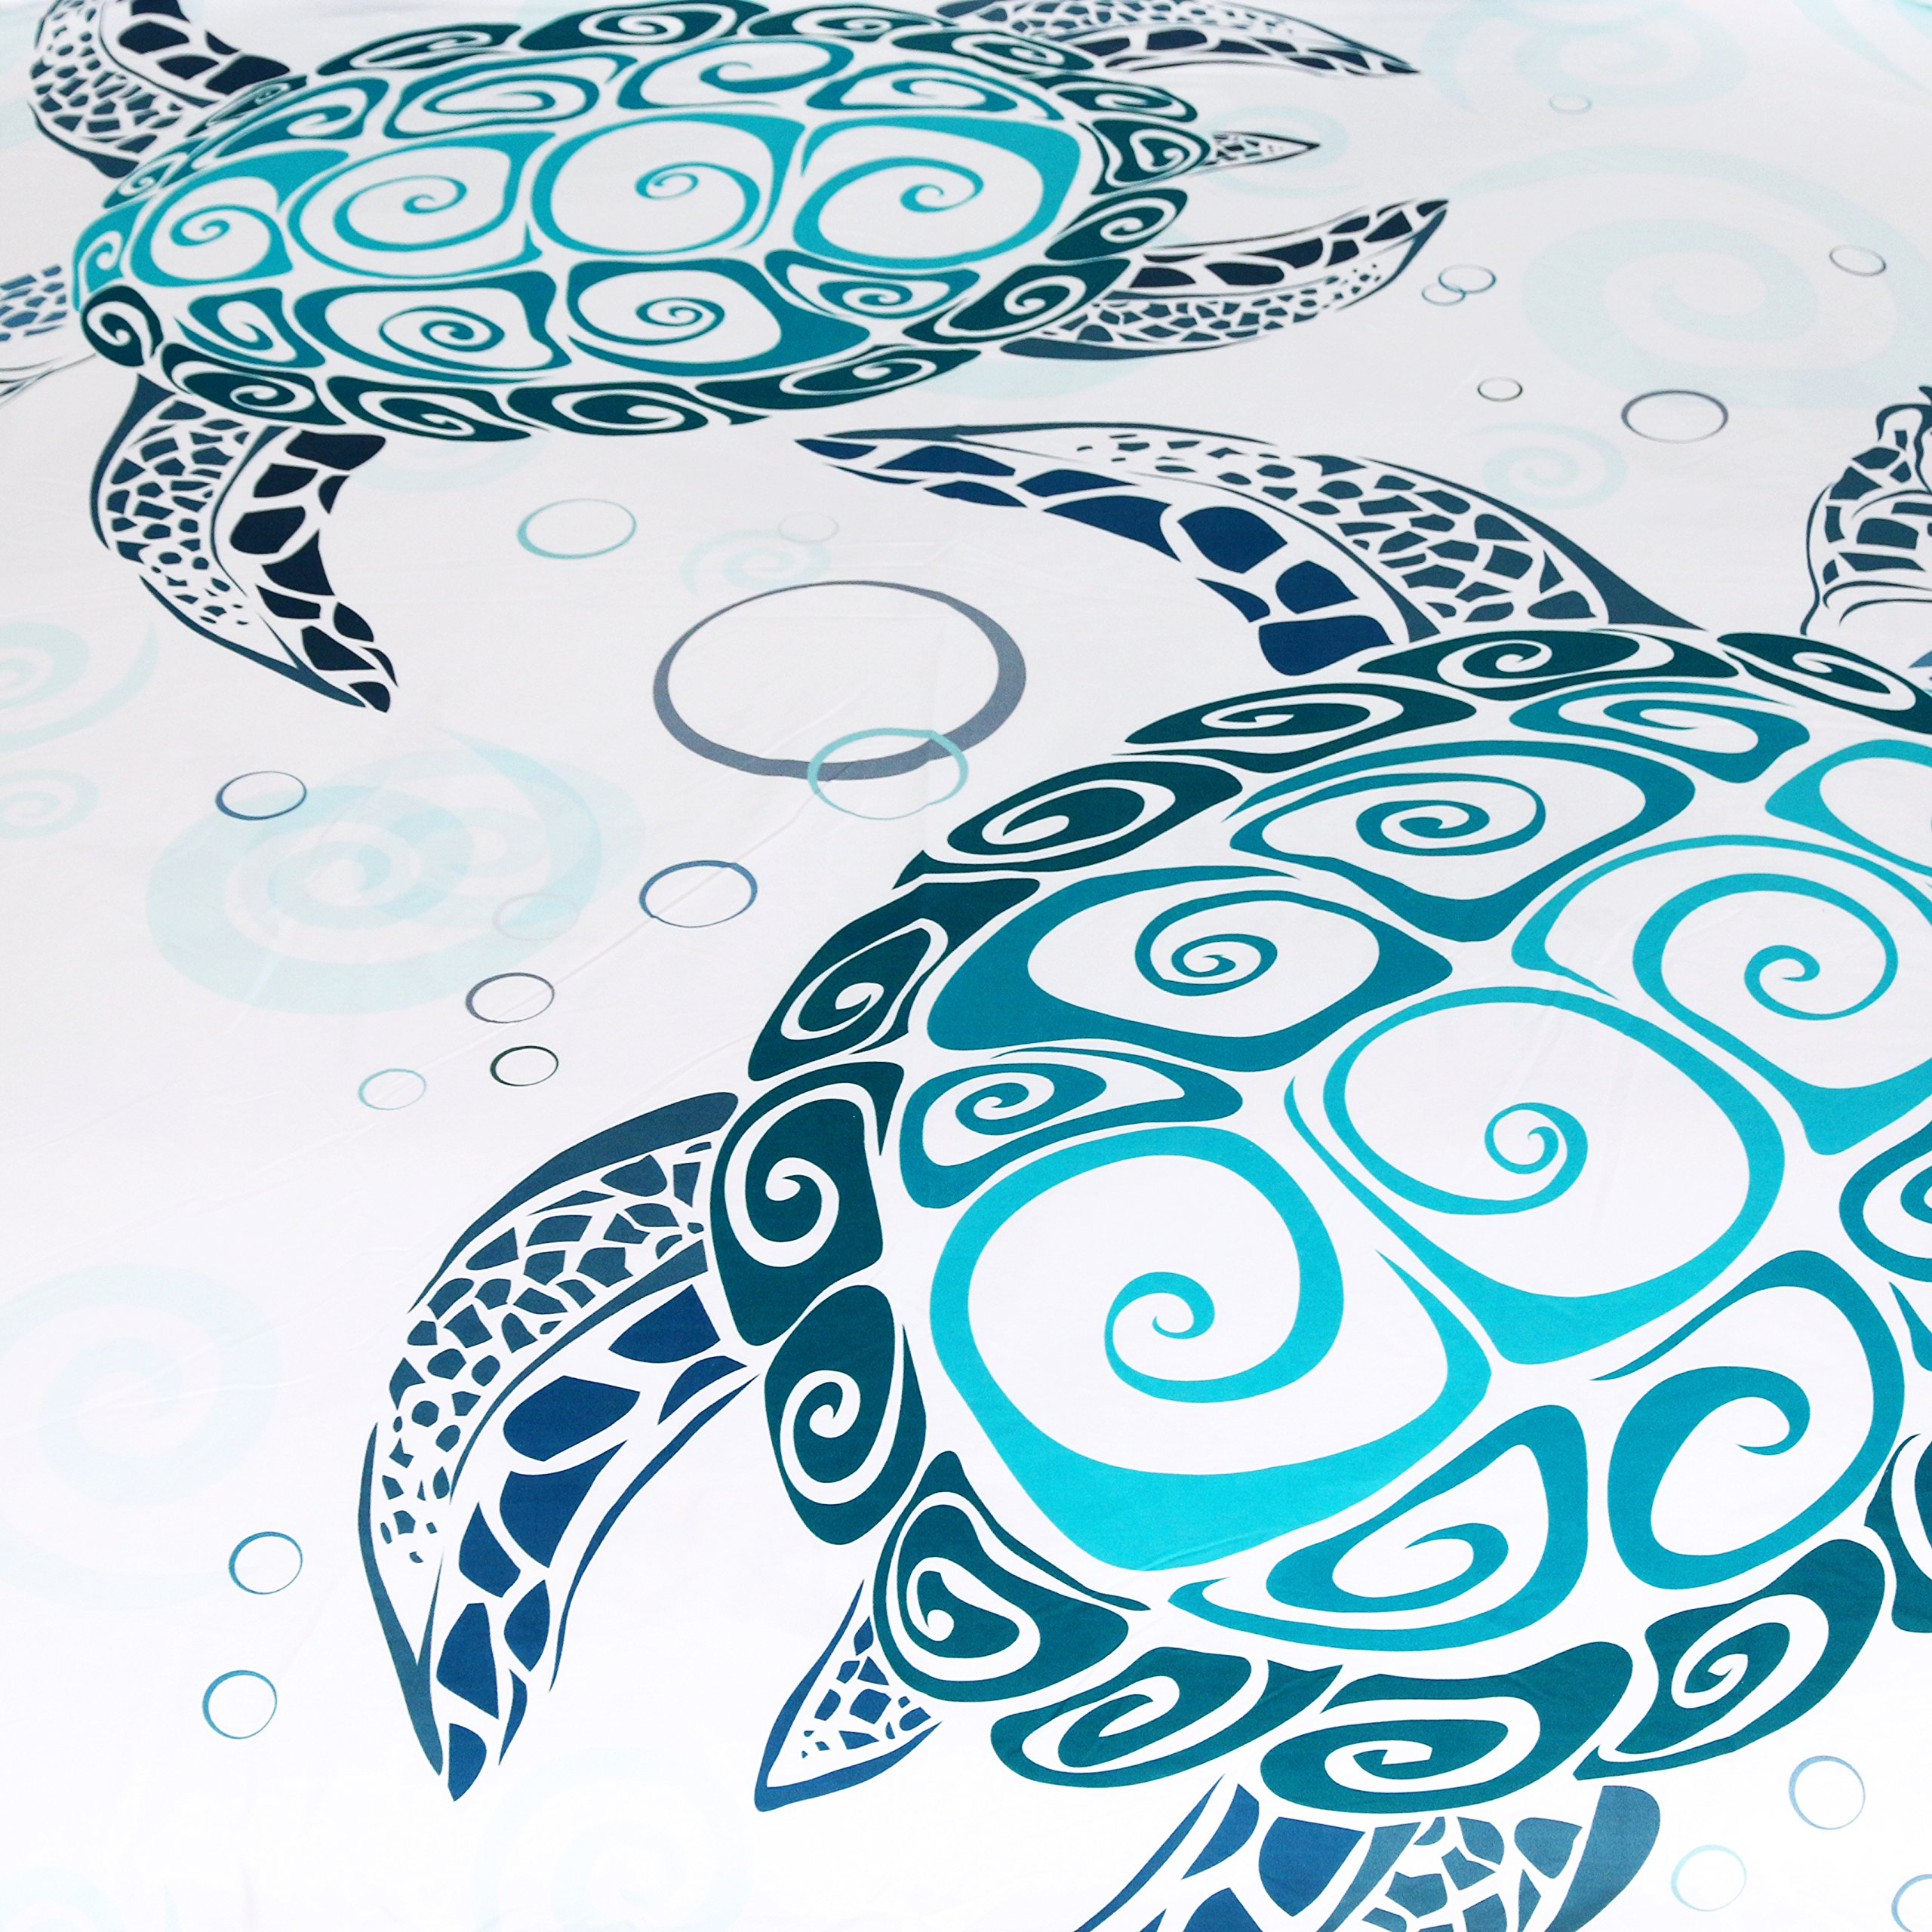 Sleepwish Turtle Bedding Royal Aqua Blue Turtles Duvet Cover 3 Piece Abstract Tortoise Bed Covers Underwater Children Bed Set (Queen) by Sleepwish (Image #2)